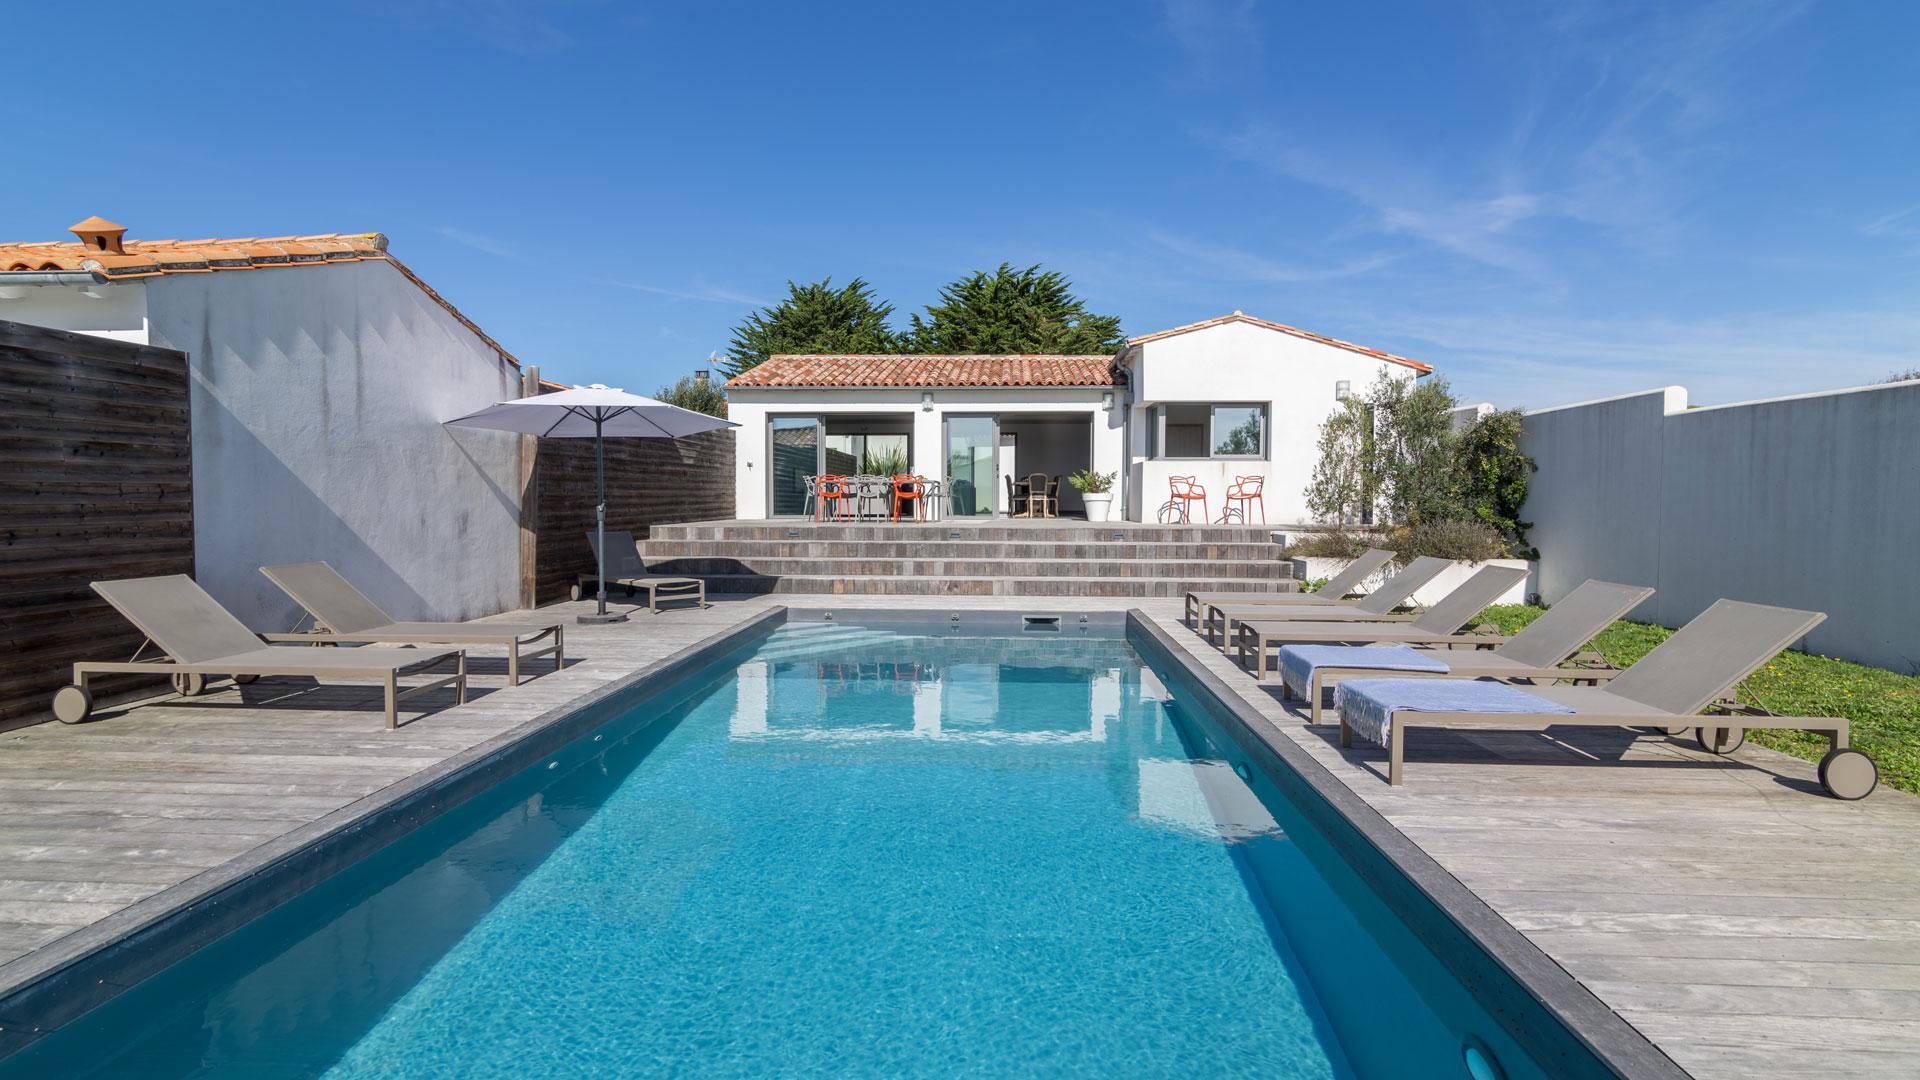 villa rosalie villa louer le de r sainte marie de r villanovo. Black Bedroom Furniture Sets. Home Design Ideas